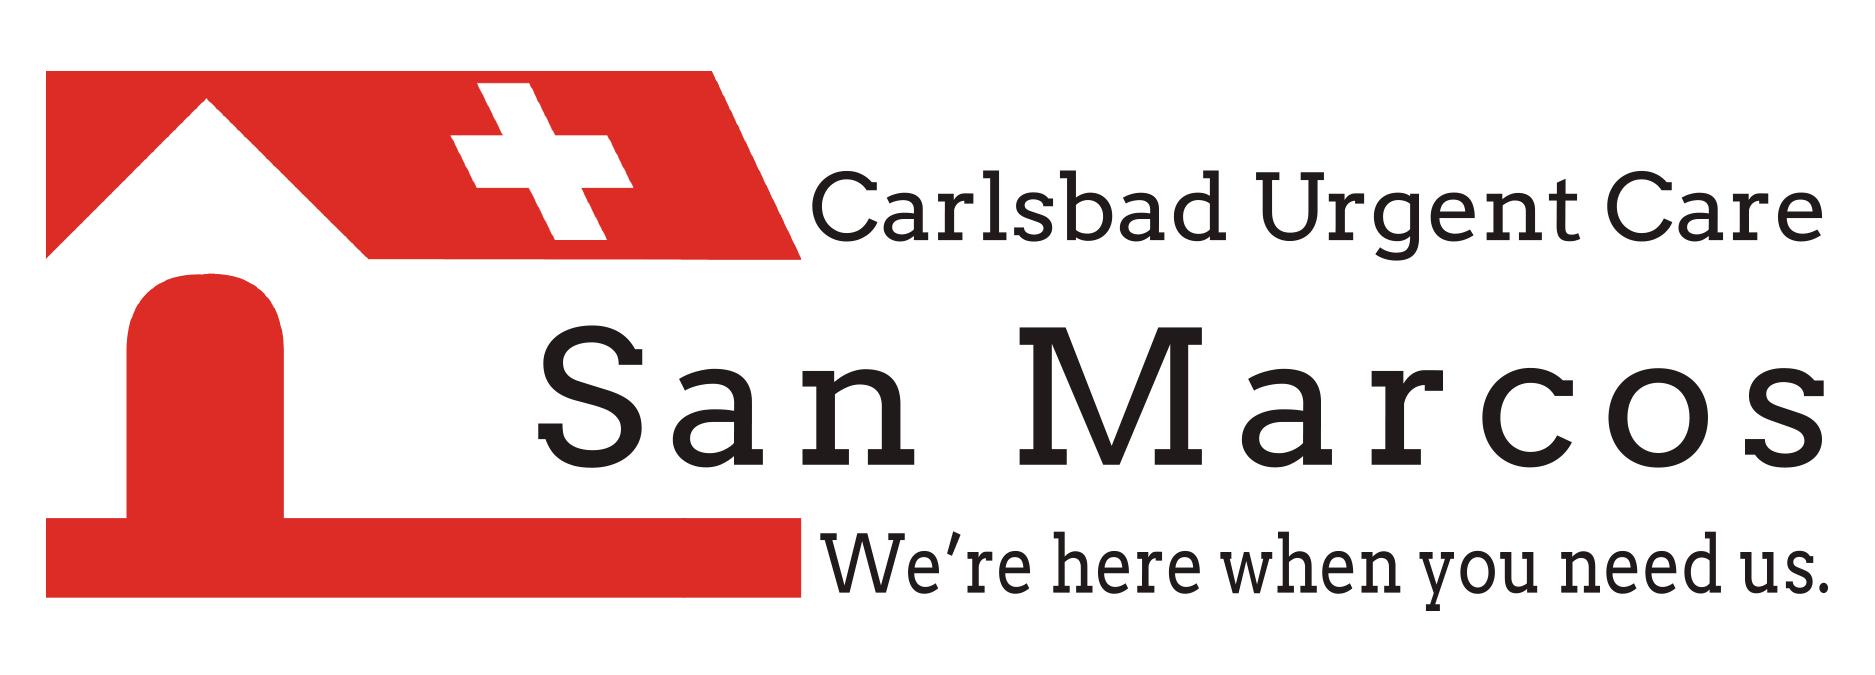 Carlsbad Urgent Care - San Marcos Logo